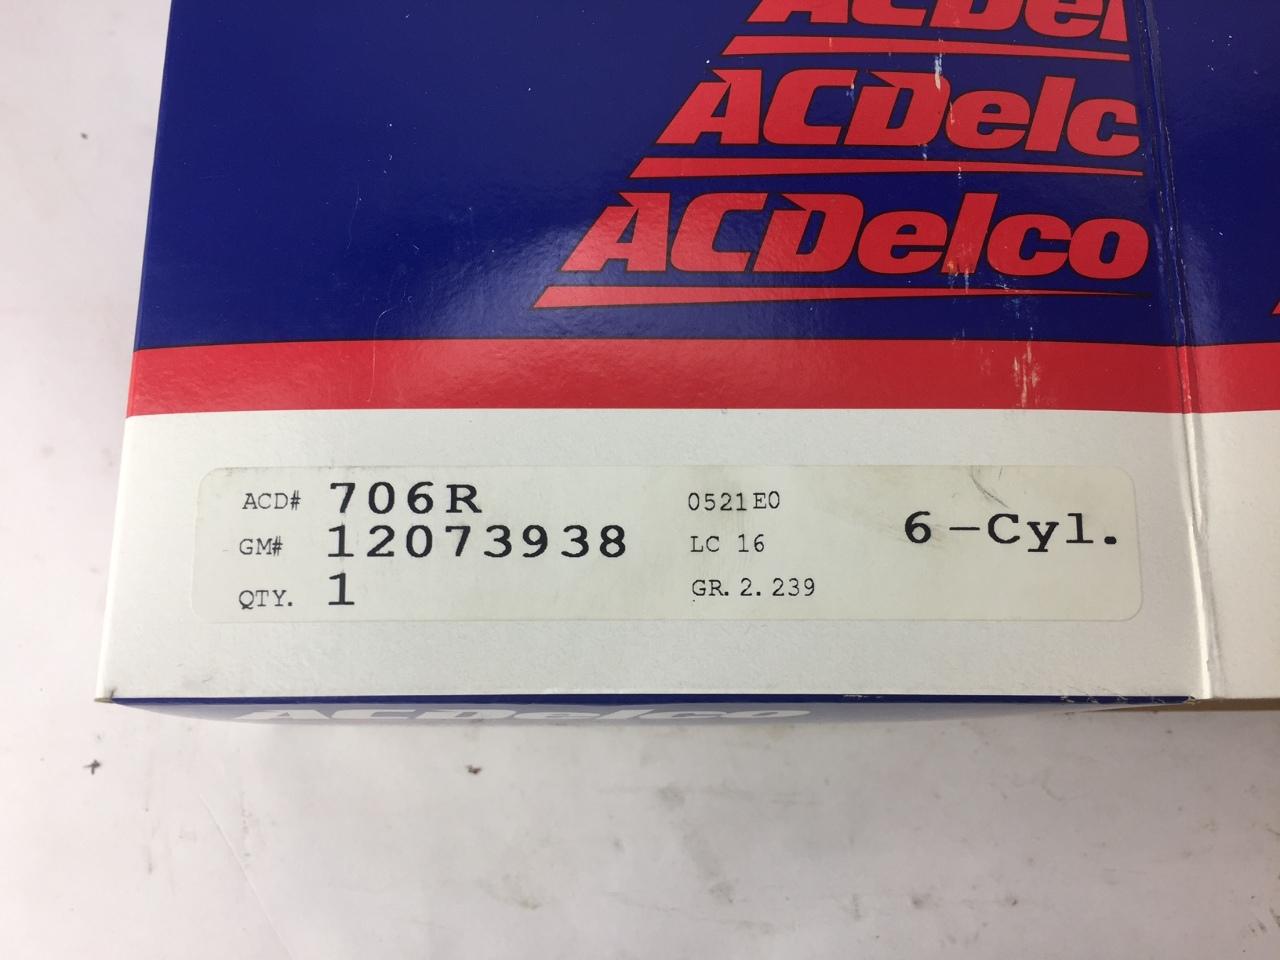 ACDelco 706R Spark Plug Wire Set | Lotastock